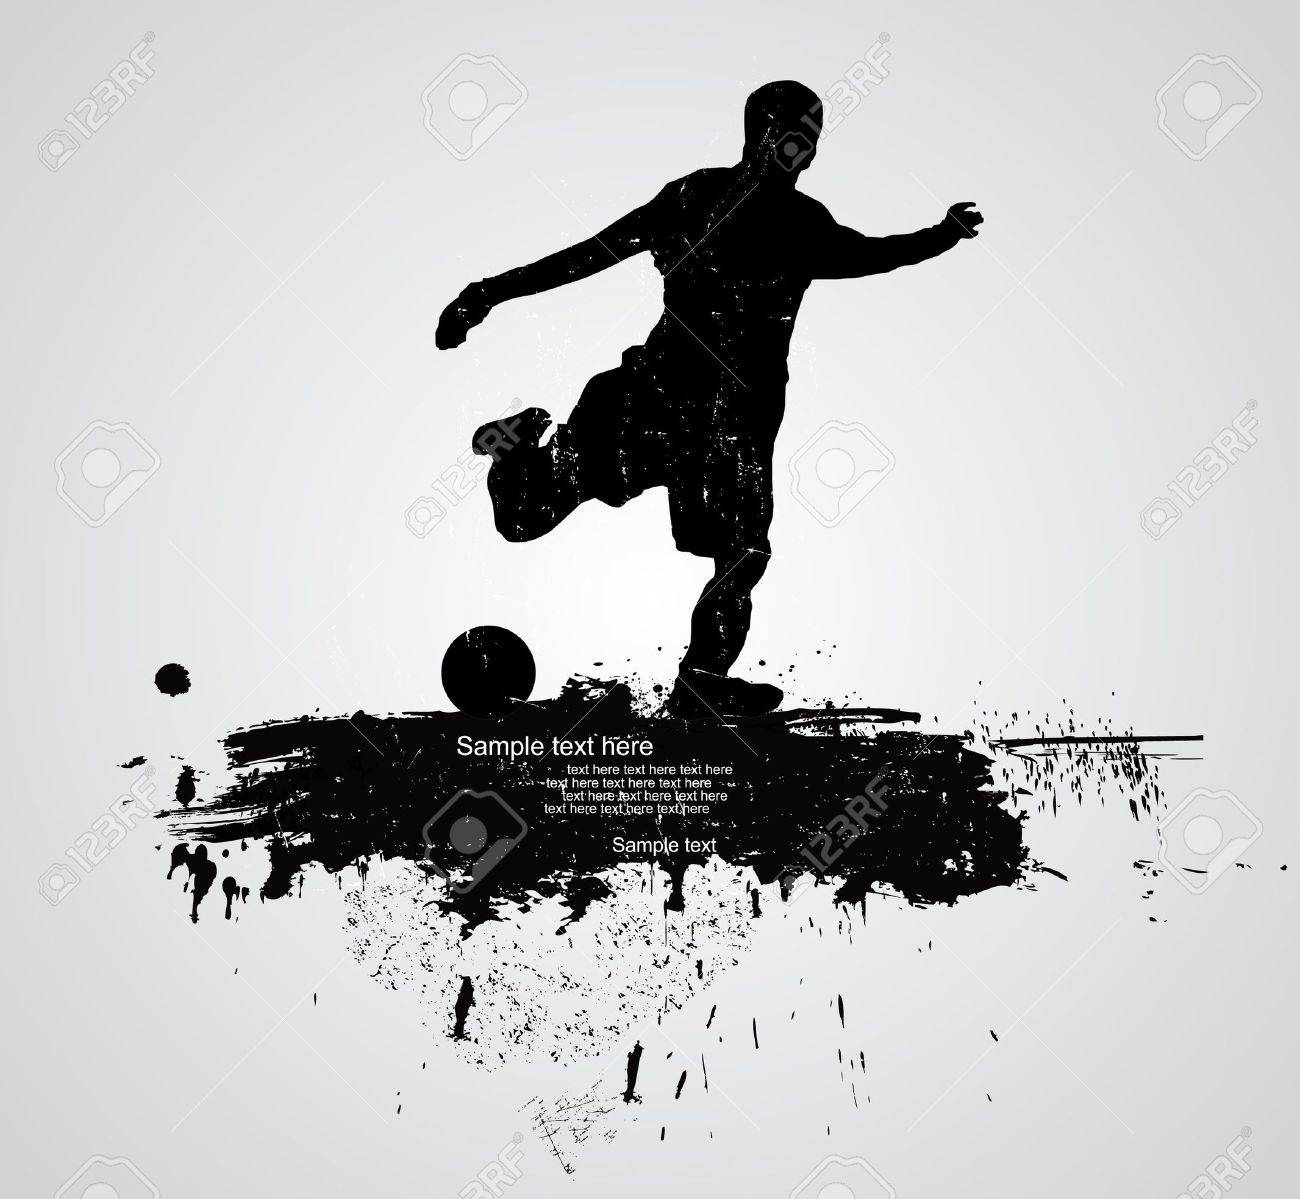 soccer player vector Stock Vector - 11551276